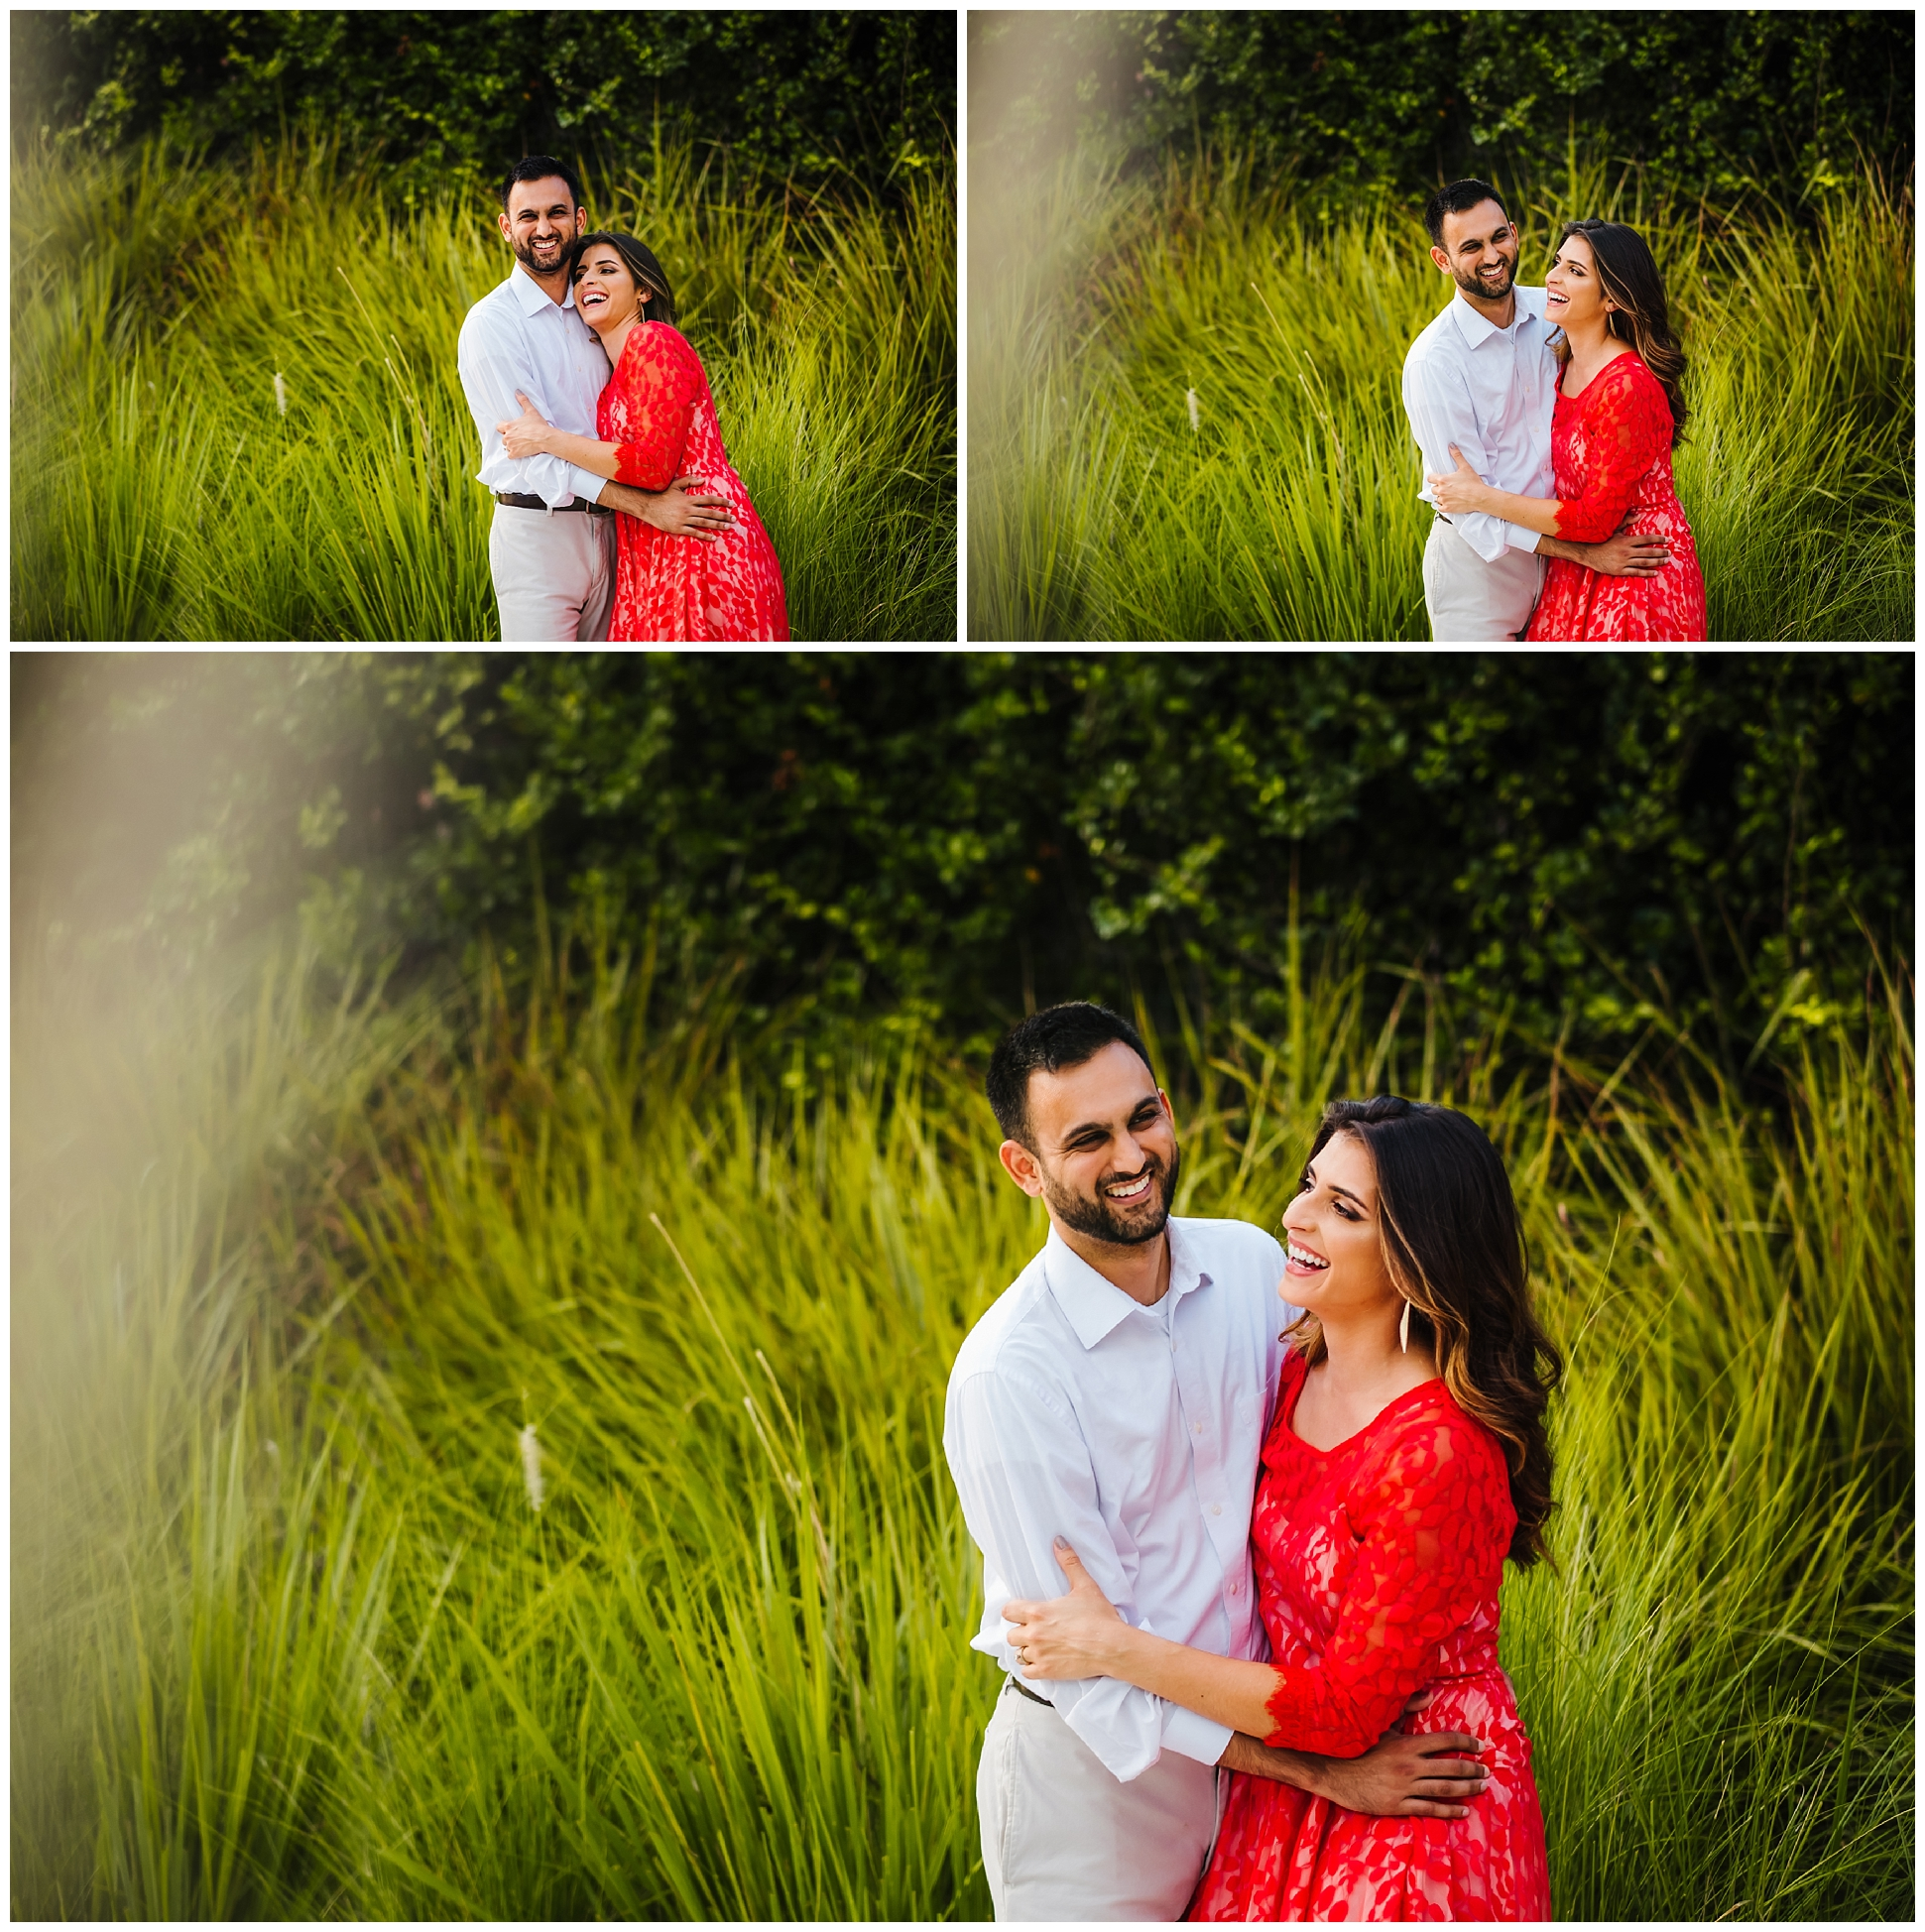 -tampa-st-pete-wedding-portrait-studio-photographer-colorful-vibrant-creative_0111.jpg